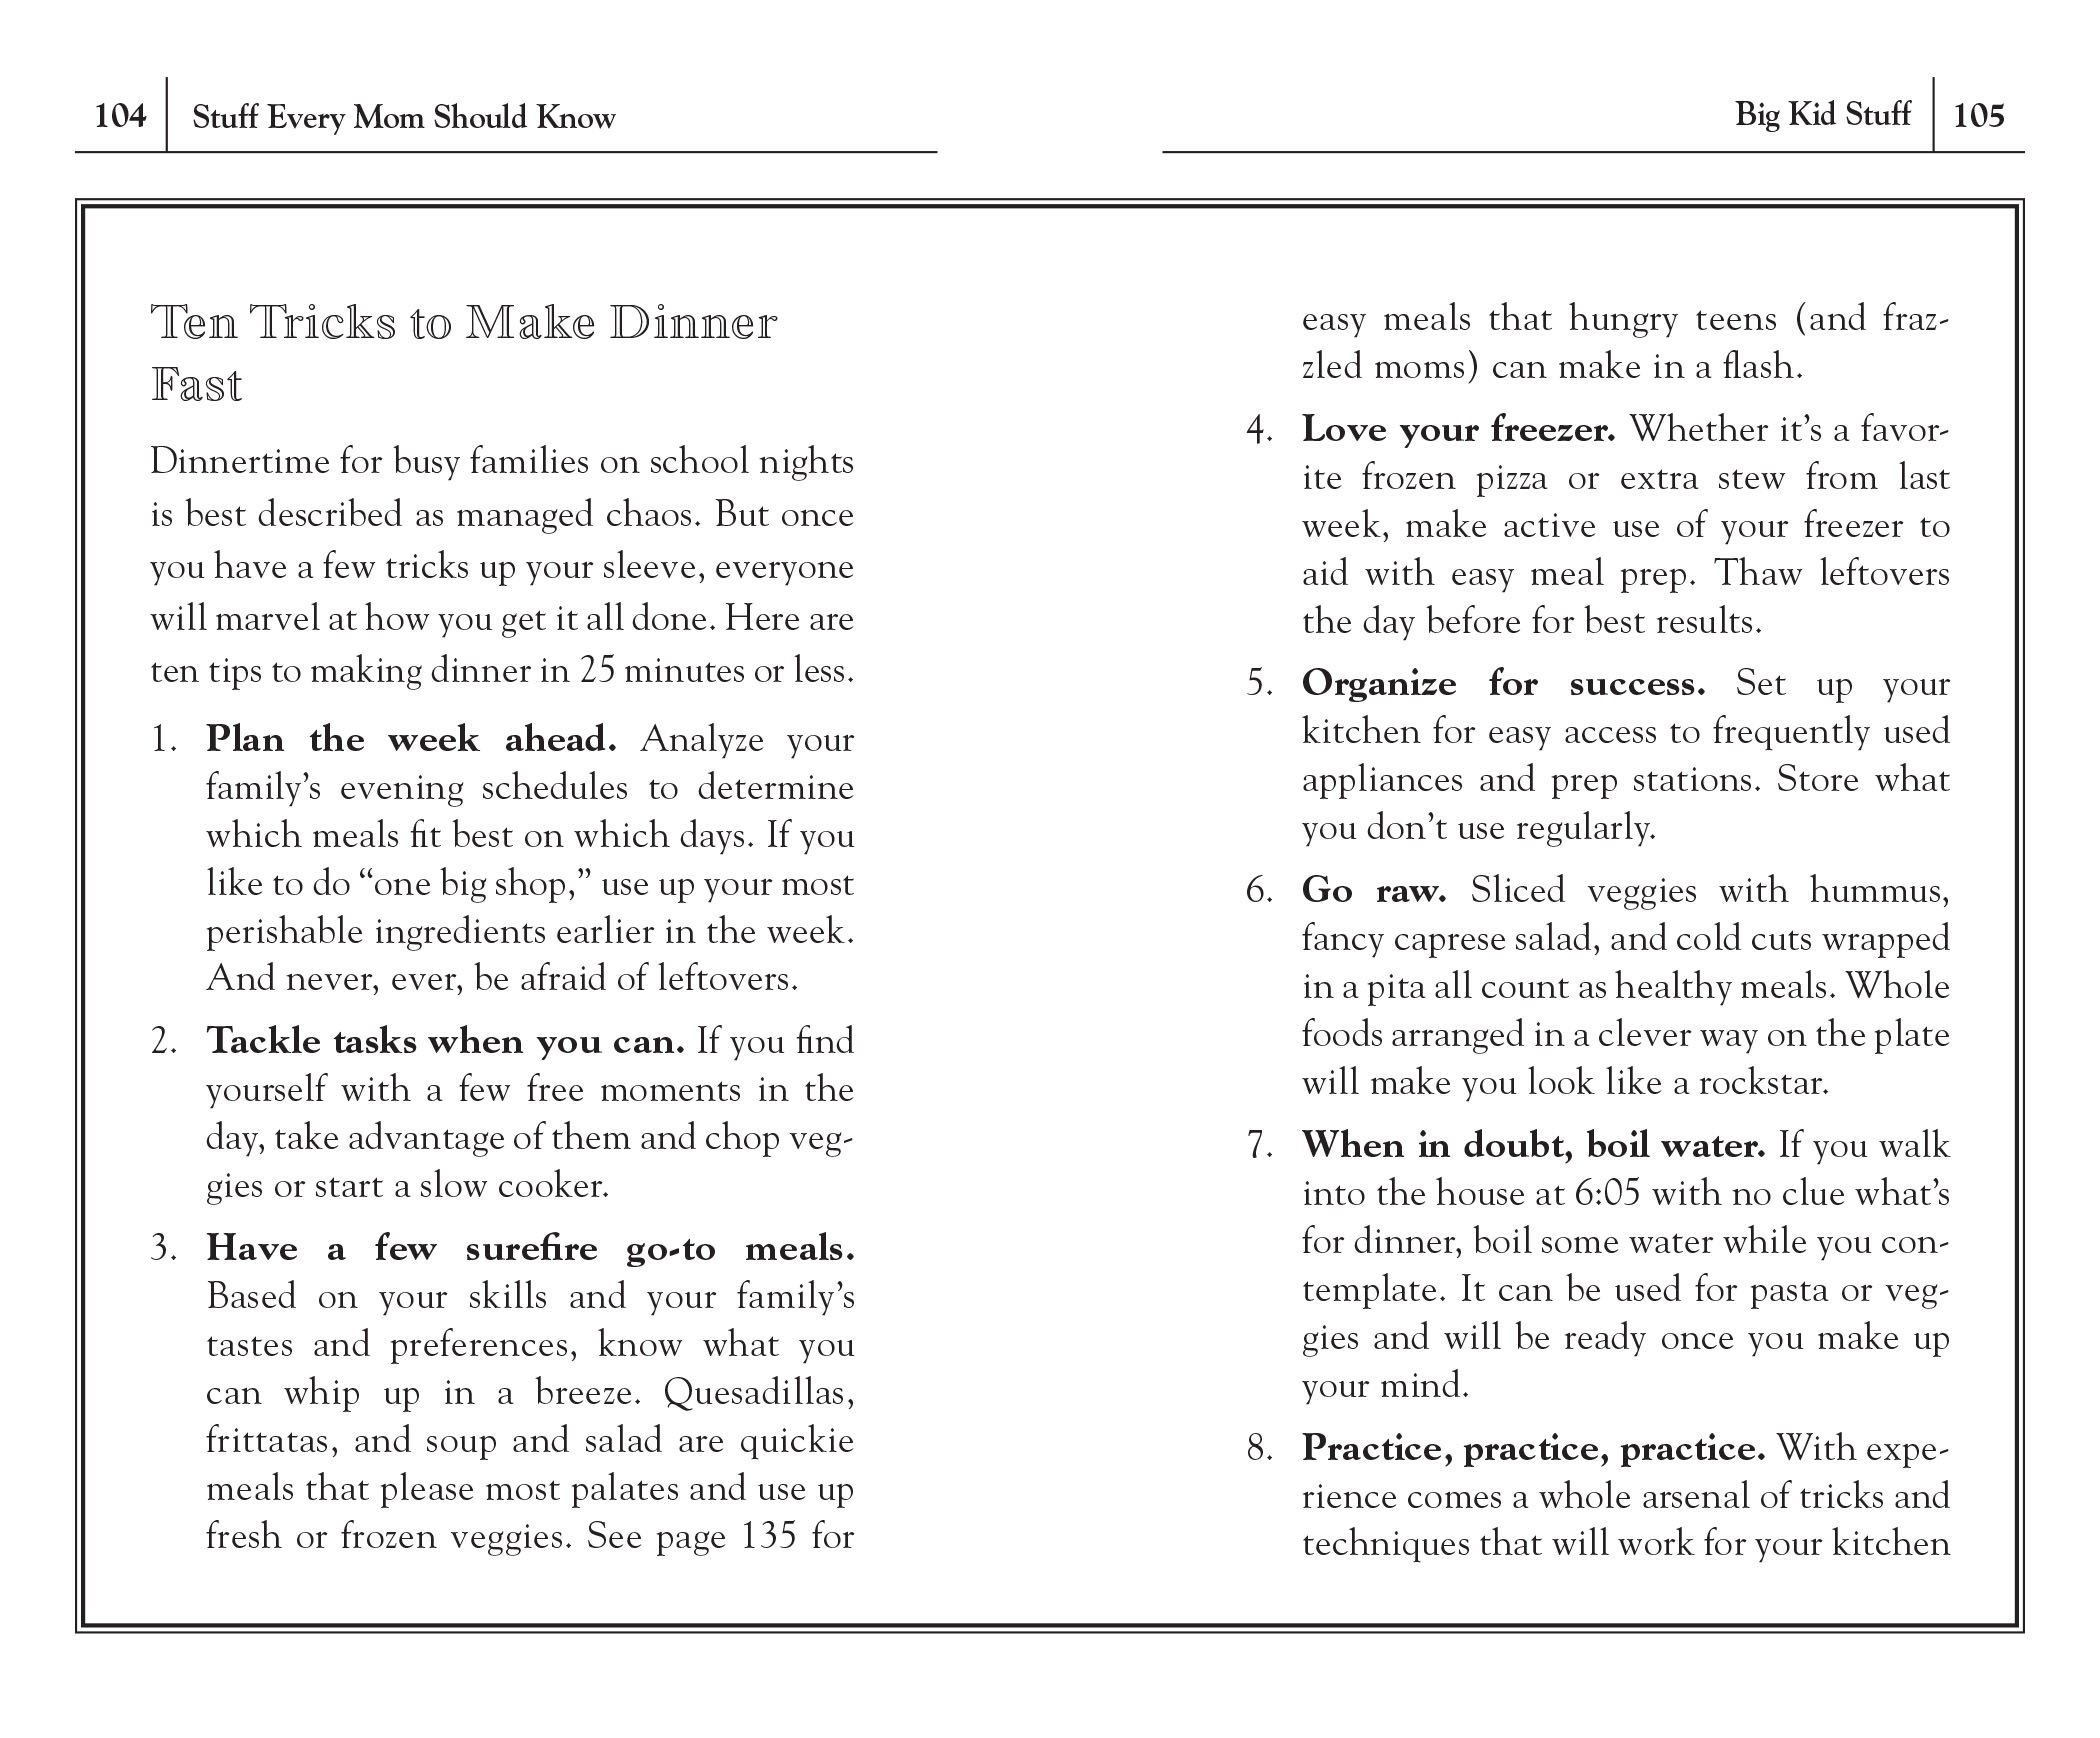 stuff every mom should know stuff you should know heather gibbs stuff every mom should know stuff you should know heather gibbs flett whitney moss 9781594745522 amazon com books